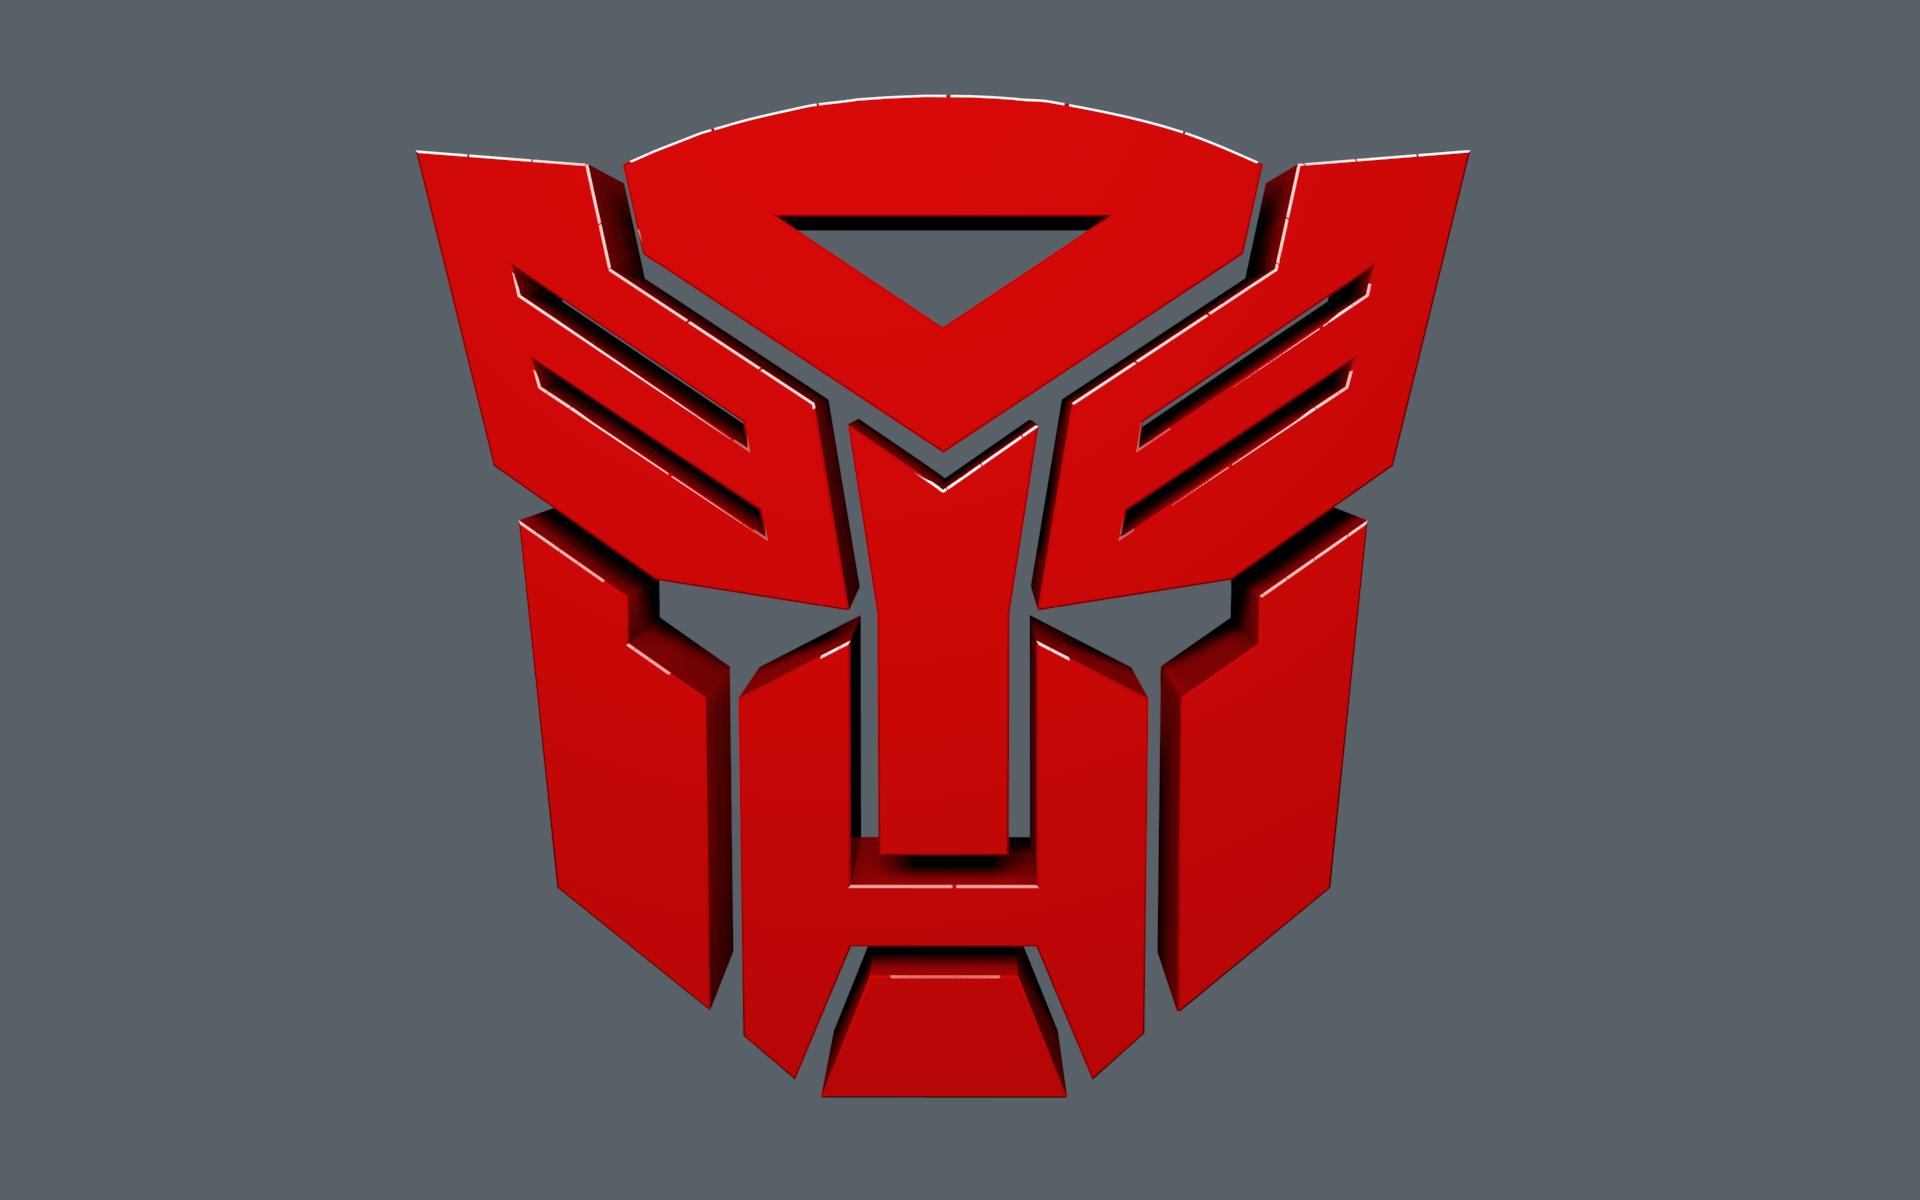 transformers red head logo 19549 transparentpng